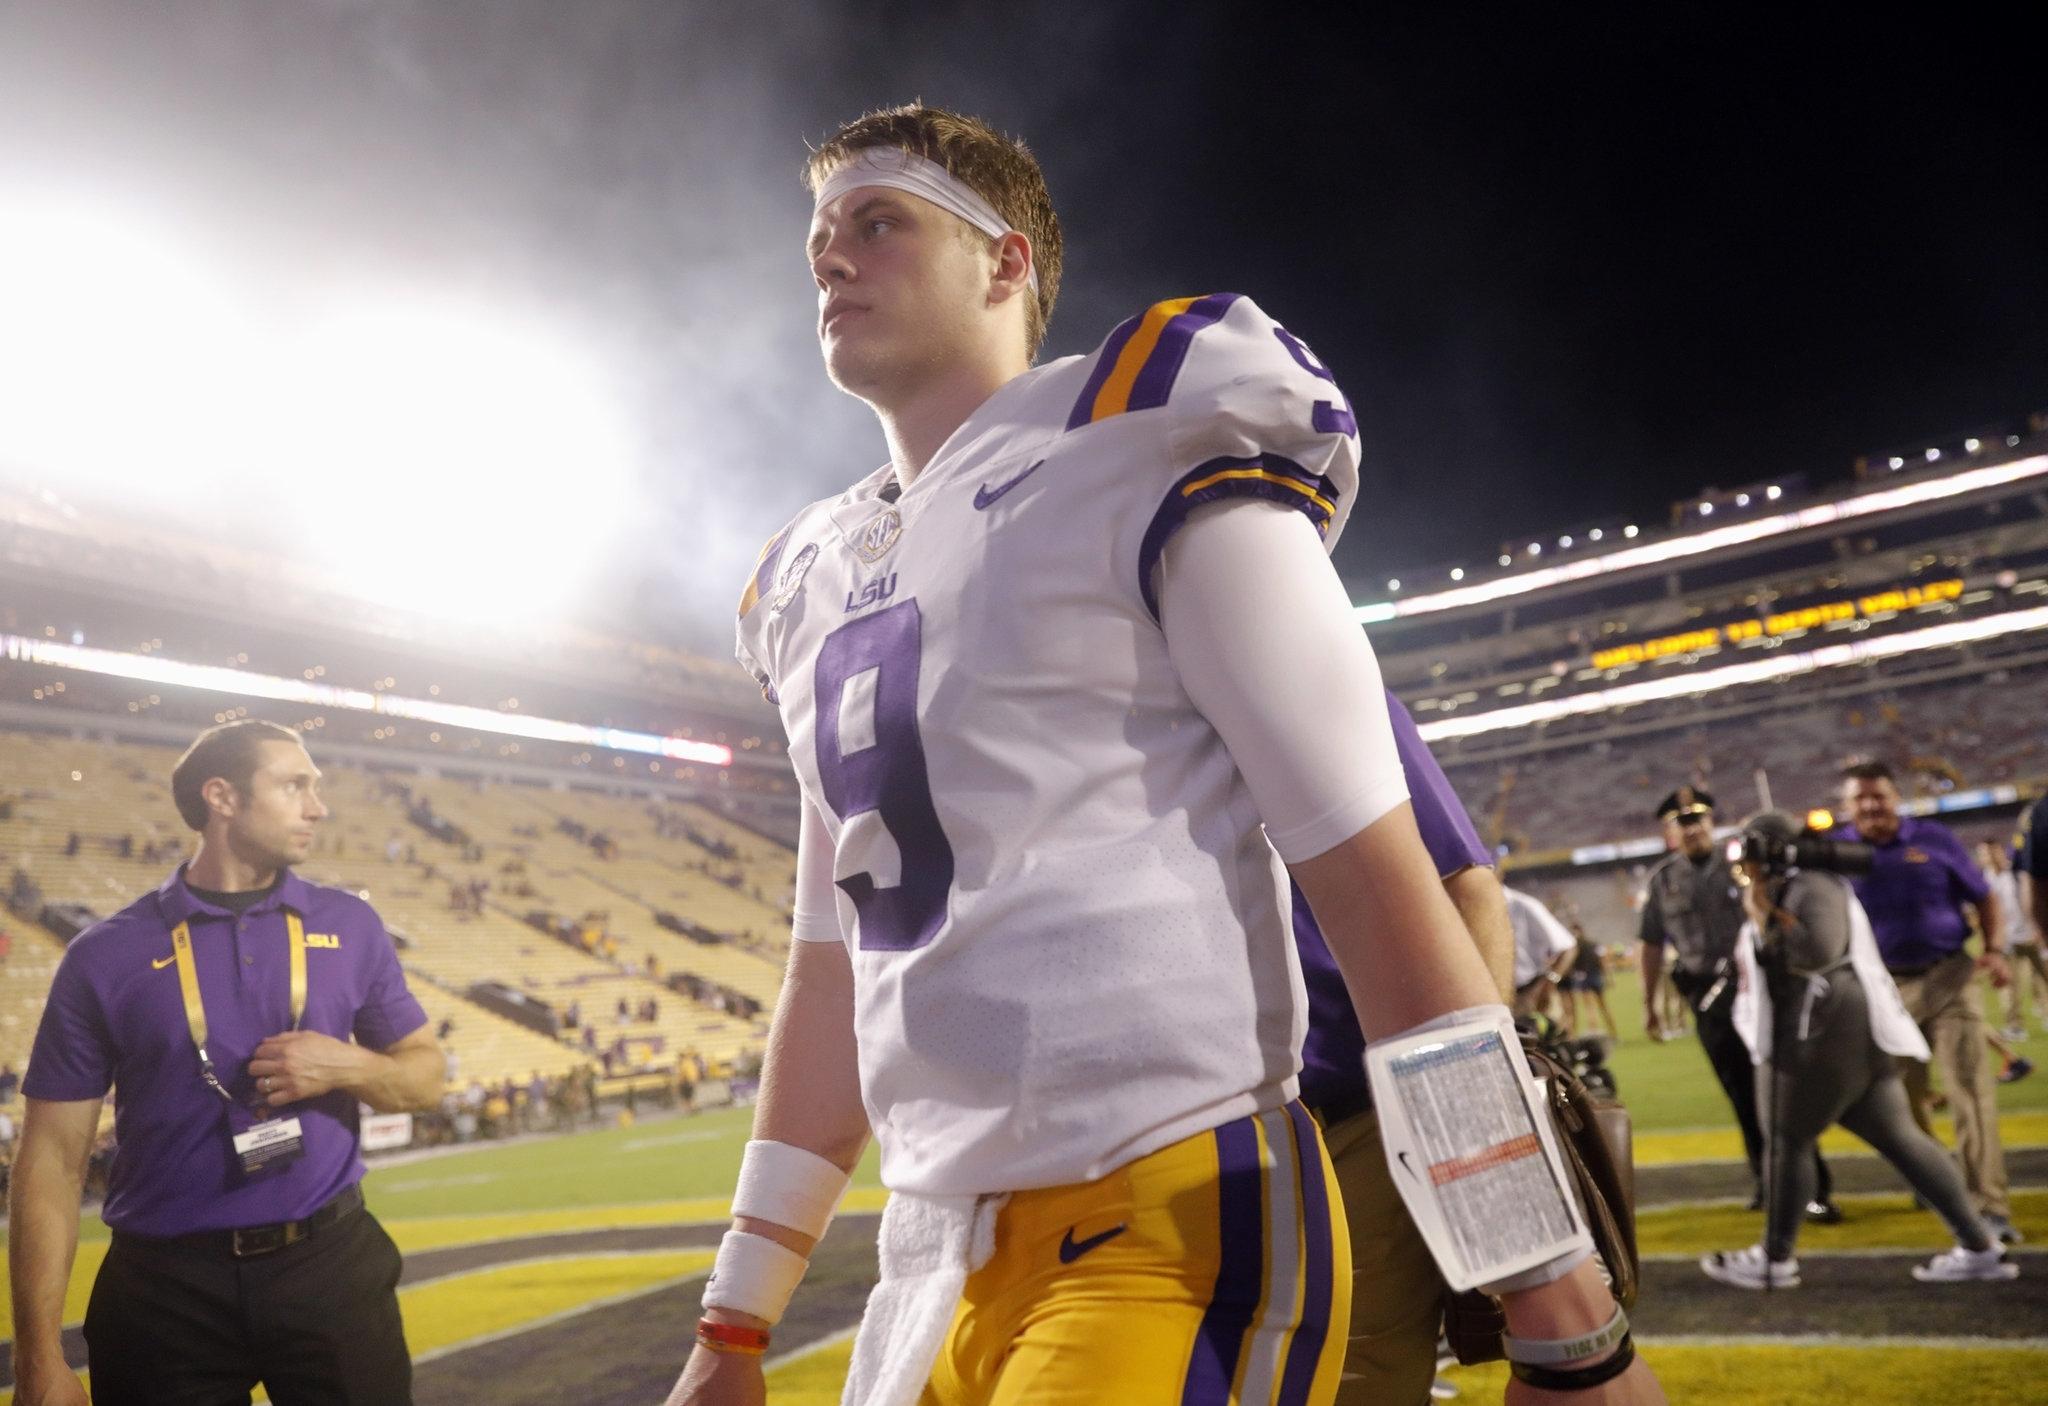 Golden Opportunity Awaits Joe Burrow, Lsu In Showdown At Auburn